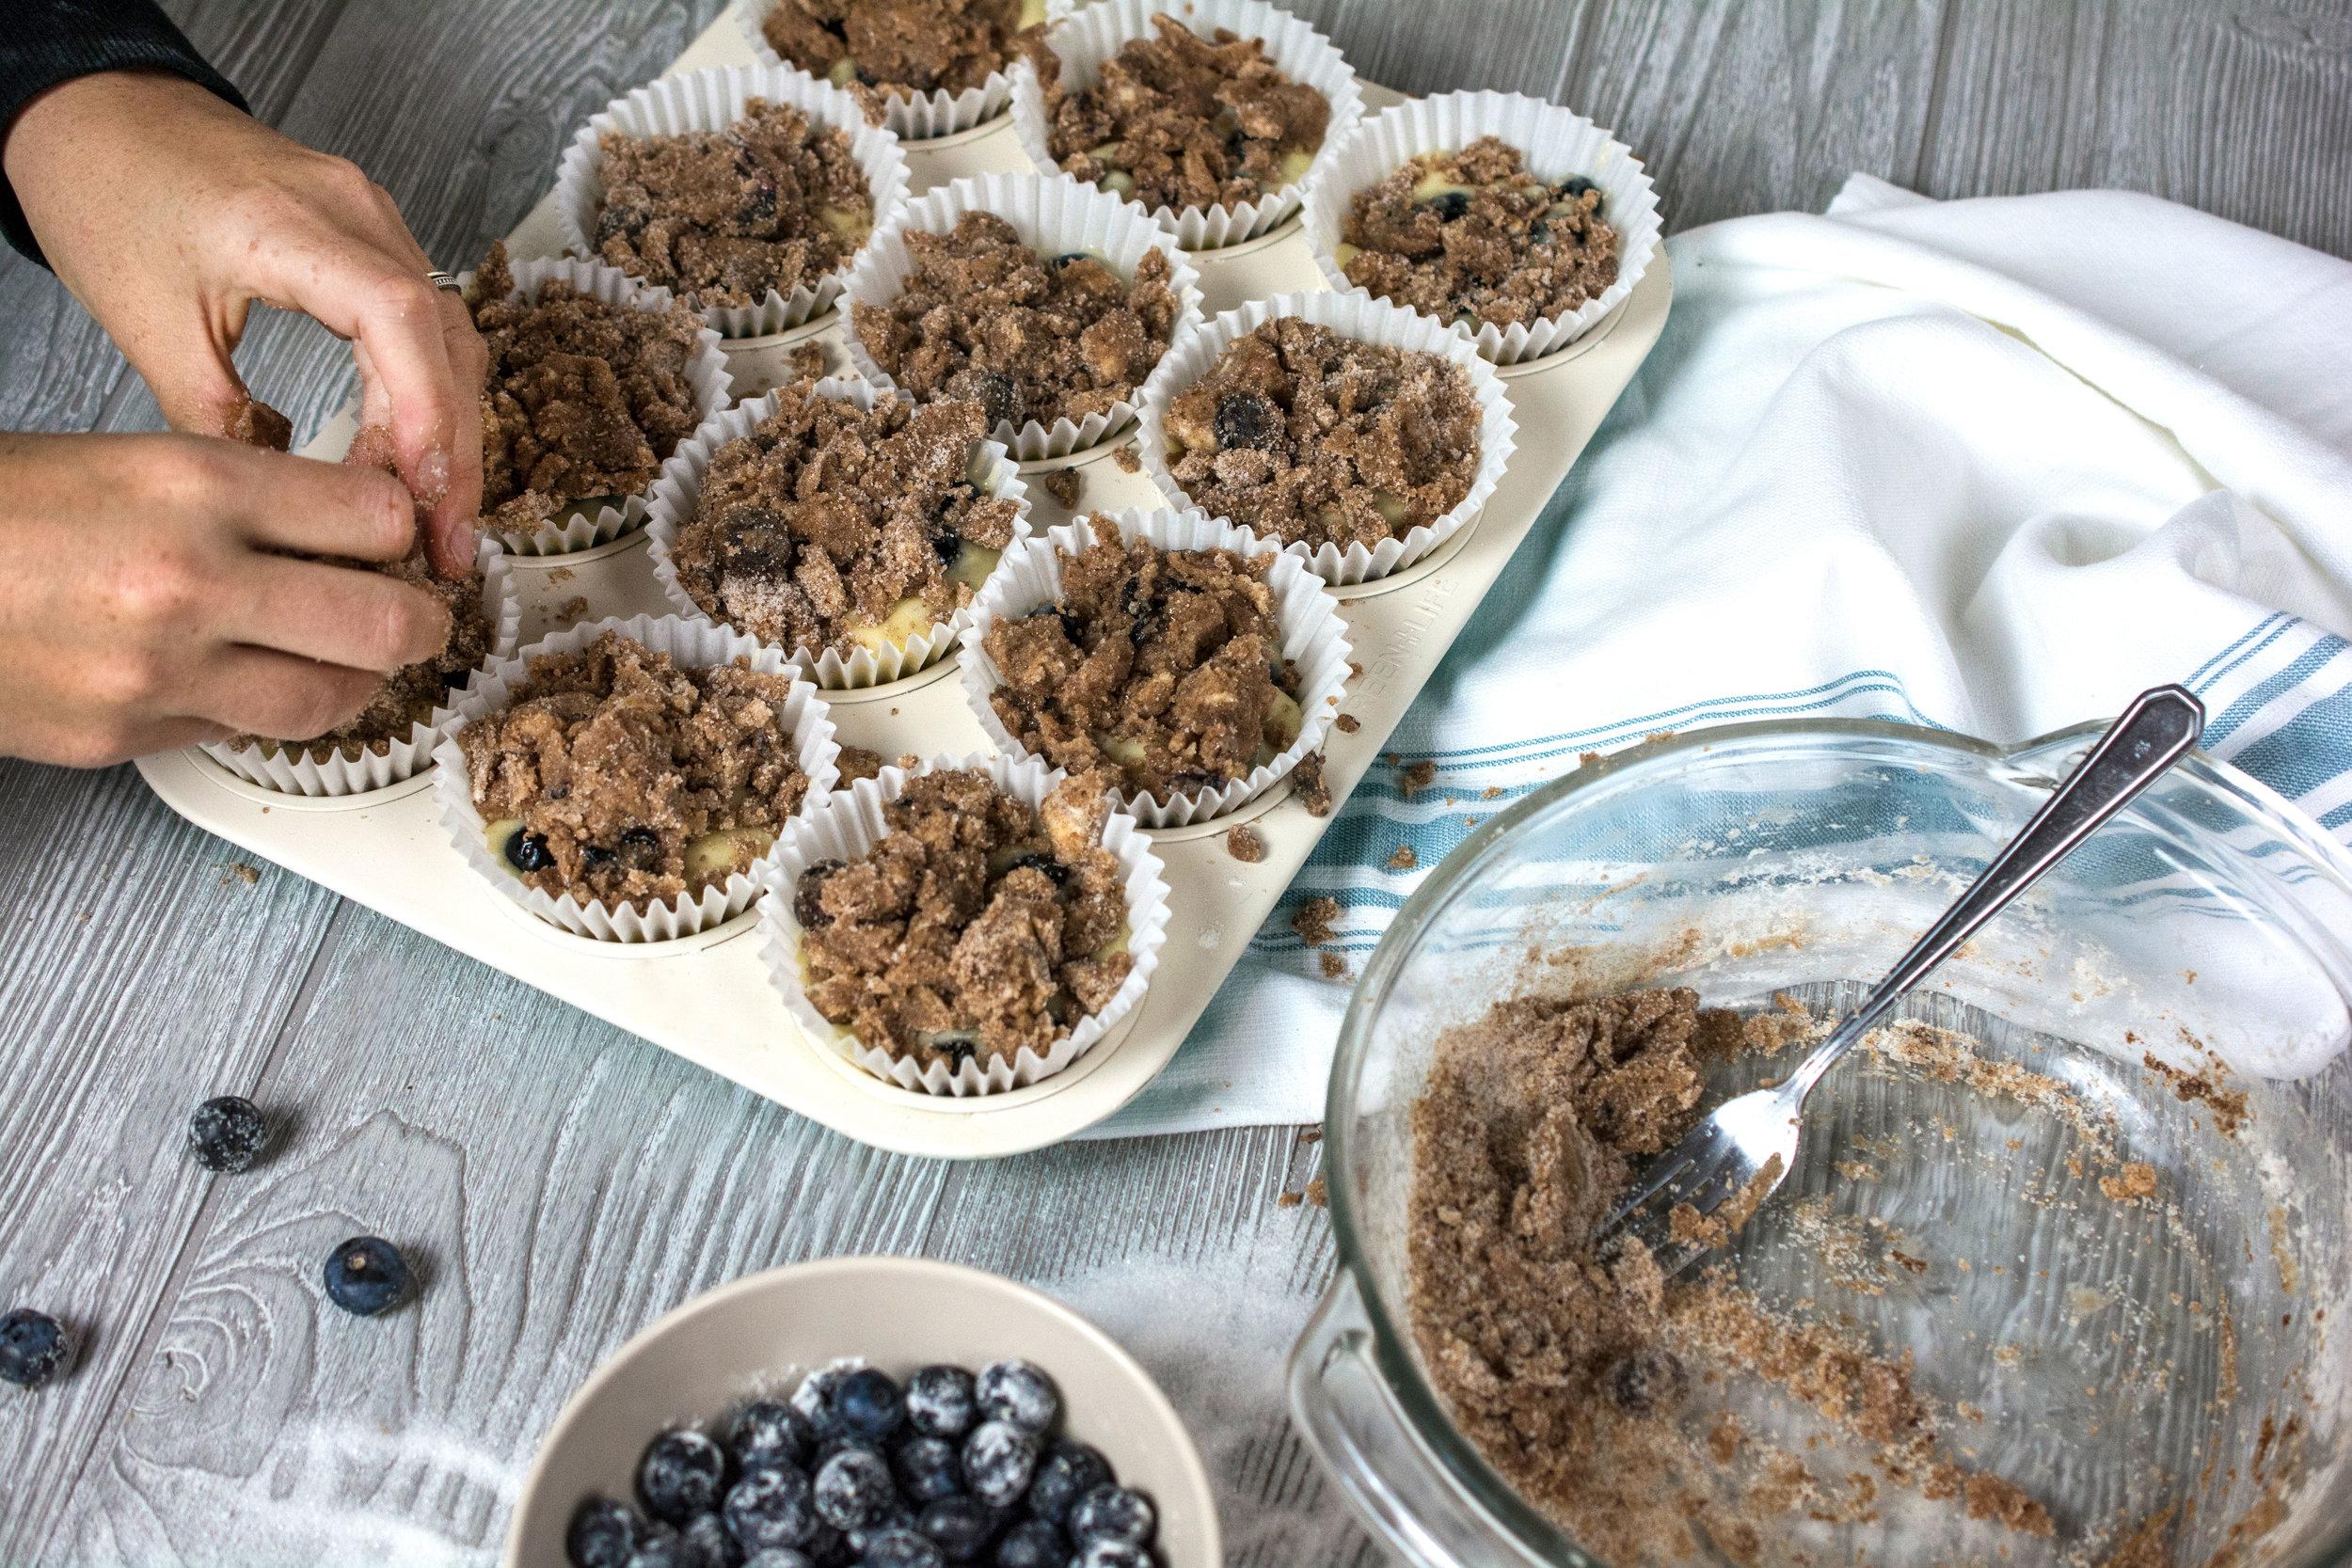 Blueberry_Muffins4_Web.jpg